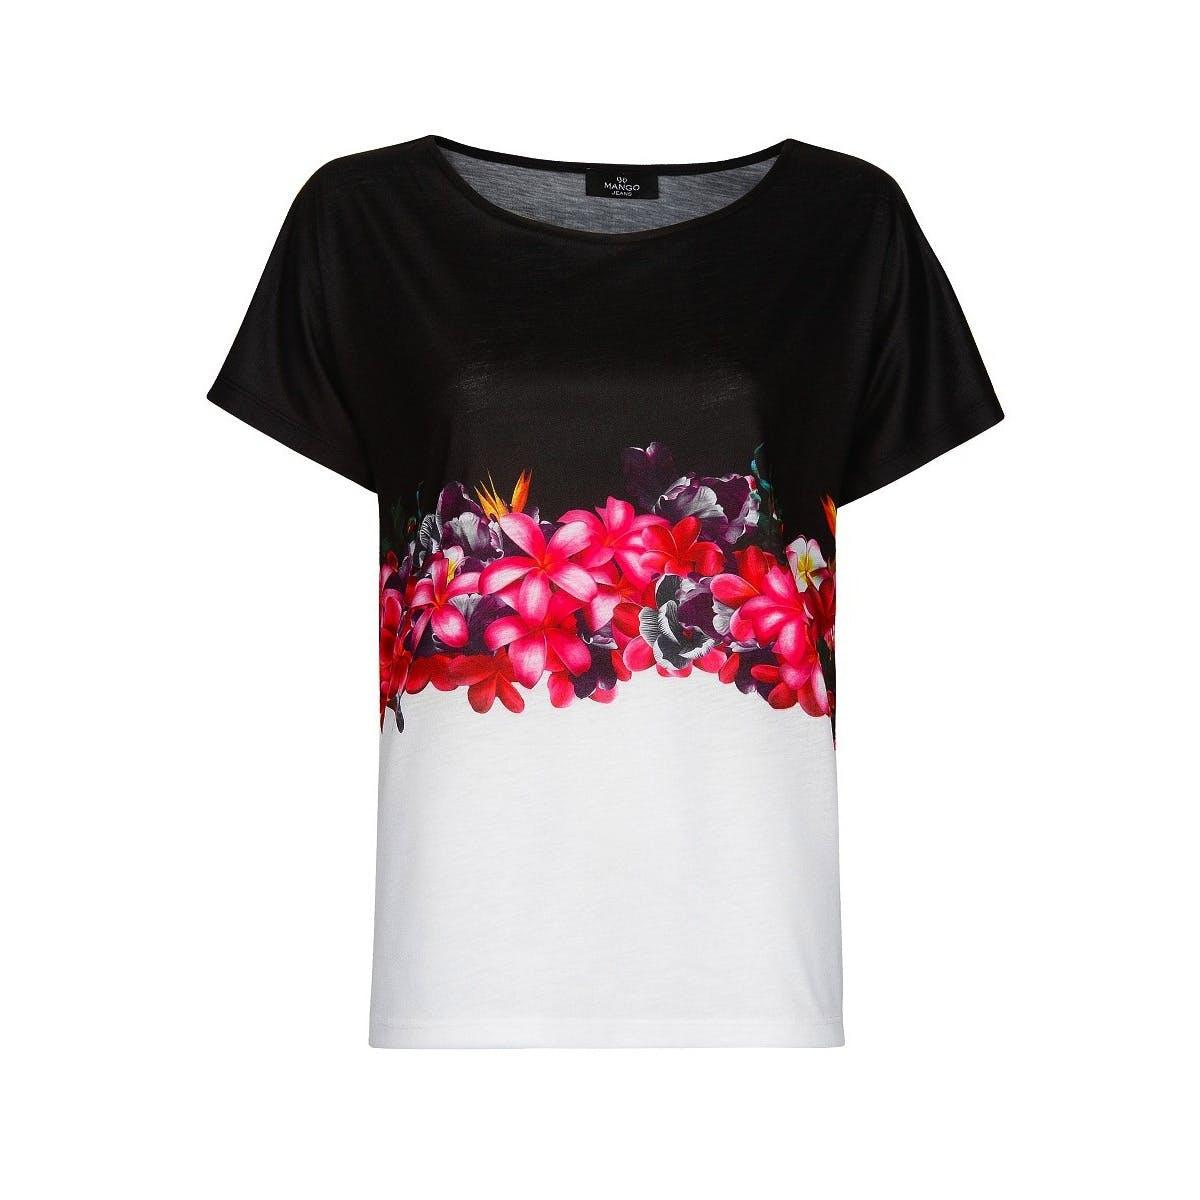 24 Fede T Shirts Med Print